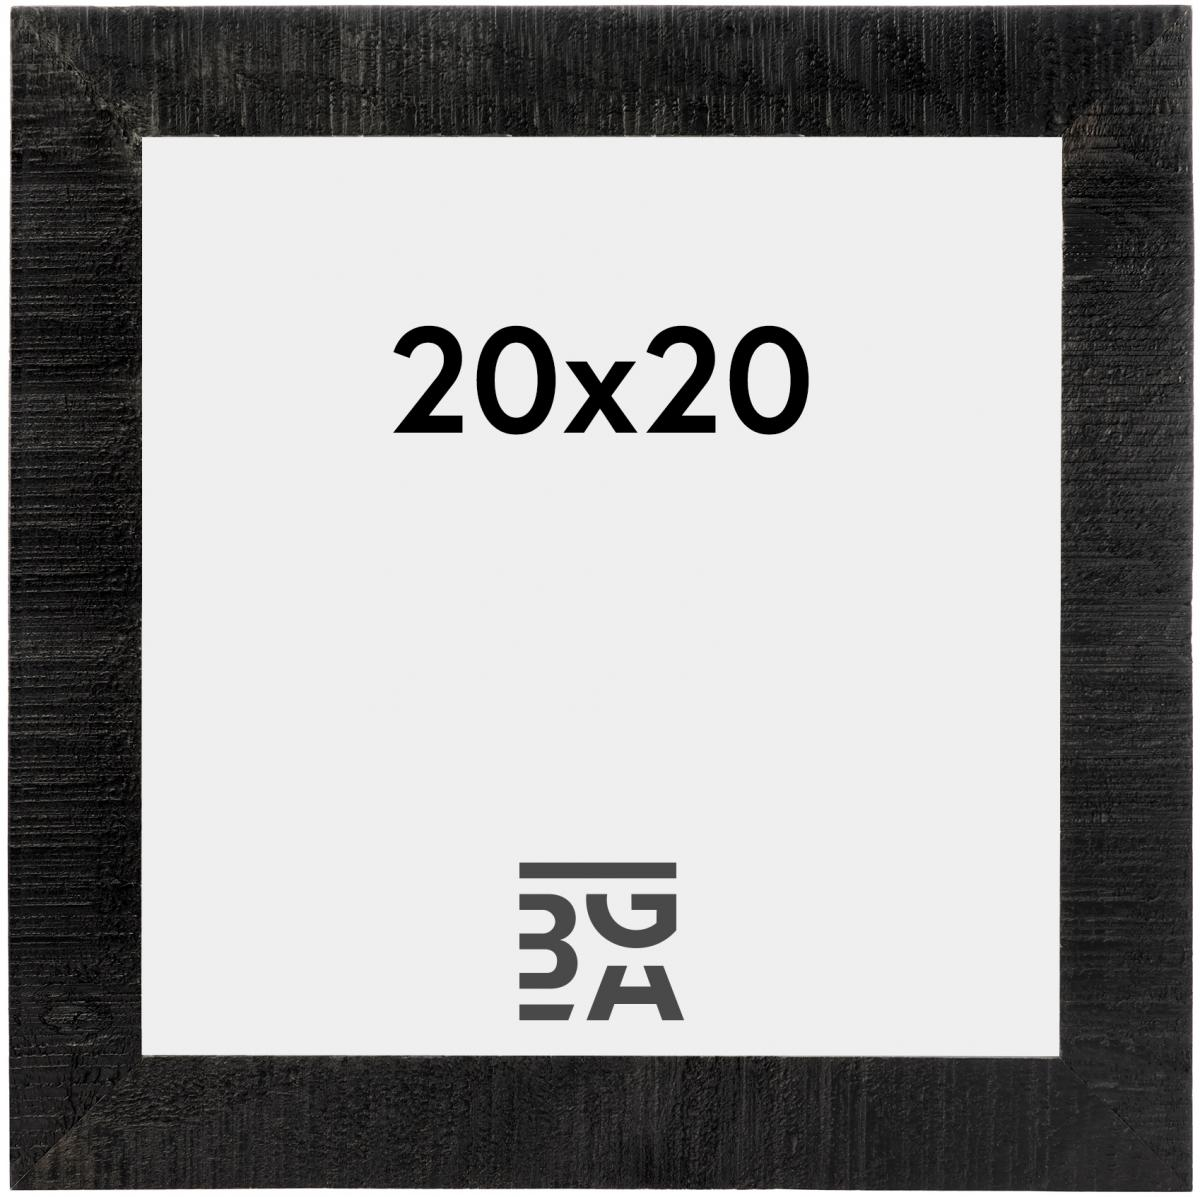 Rahmen Home Schwarz 20x20 cm